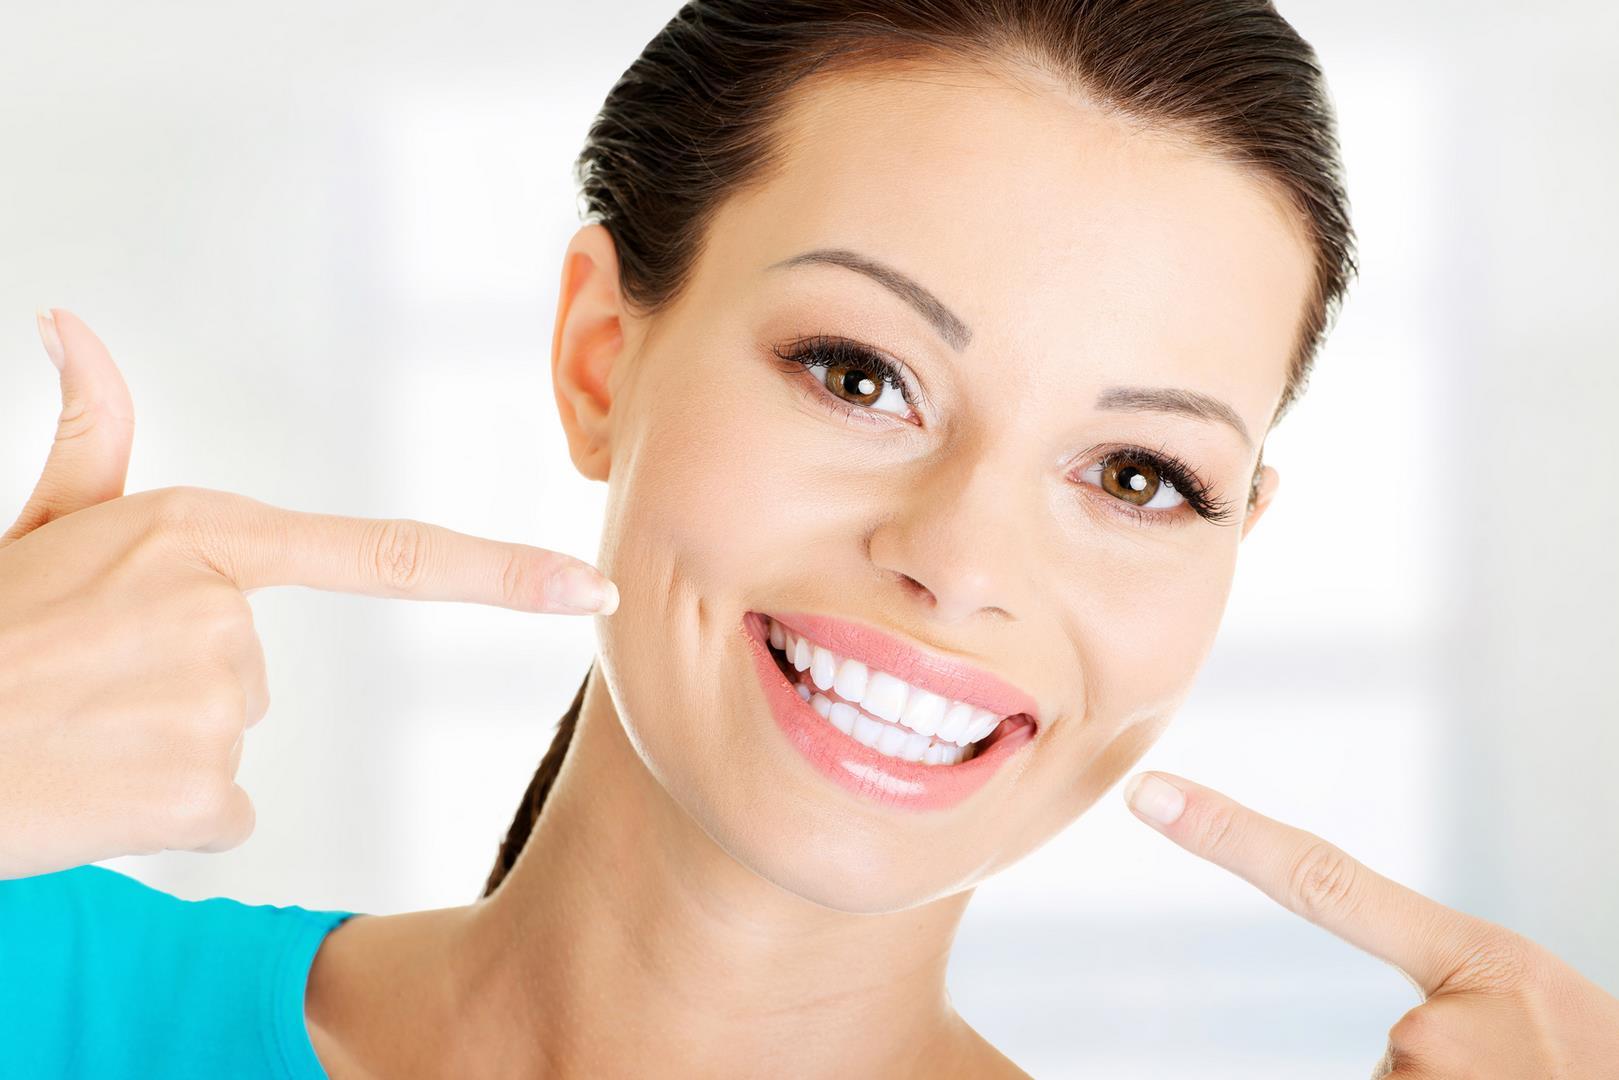 Hayouma-Ninael-dentiste-13005-orthodontie-alignement-dents-1